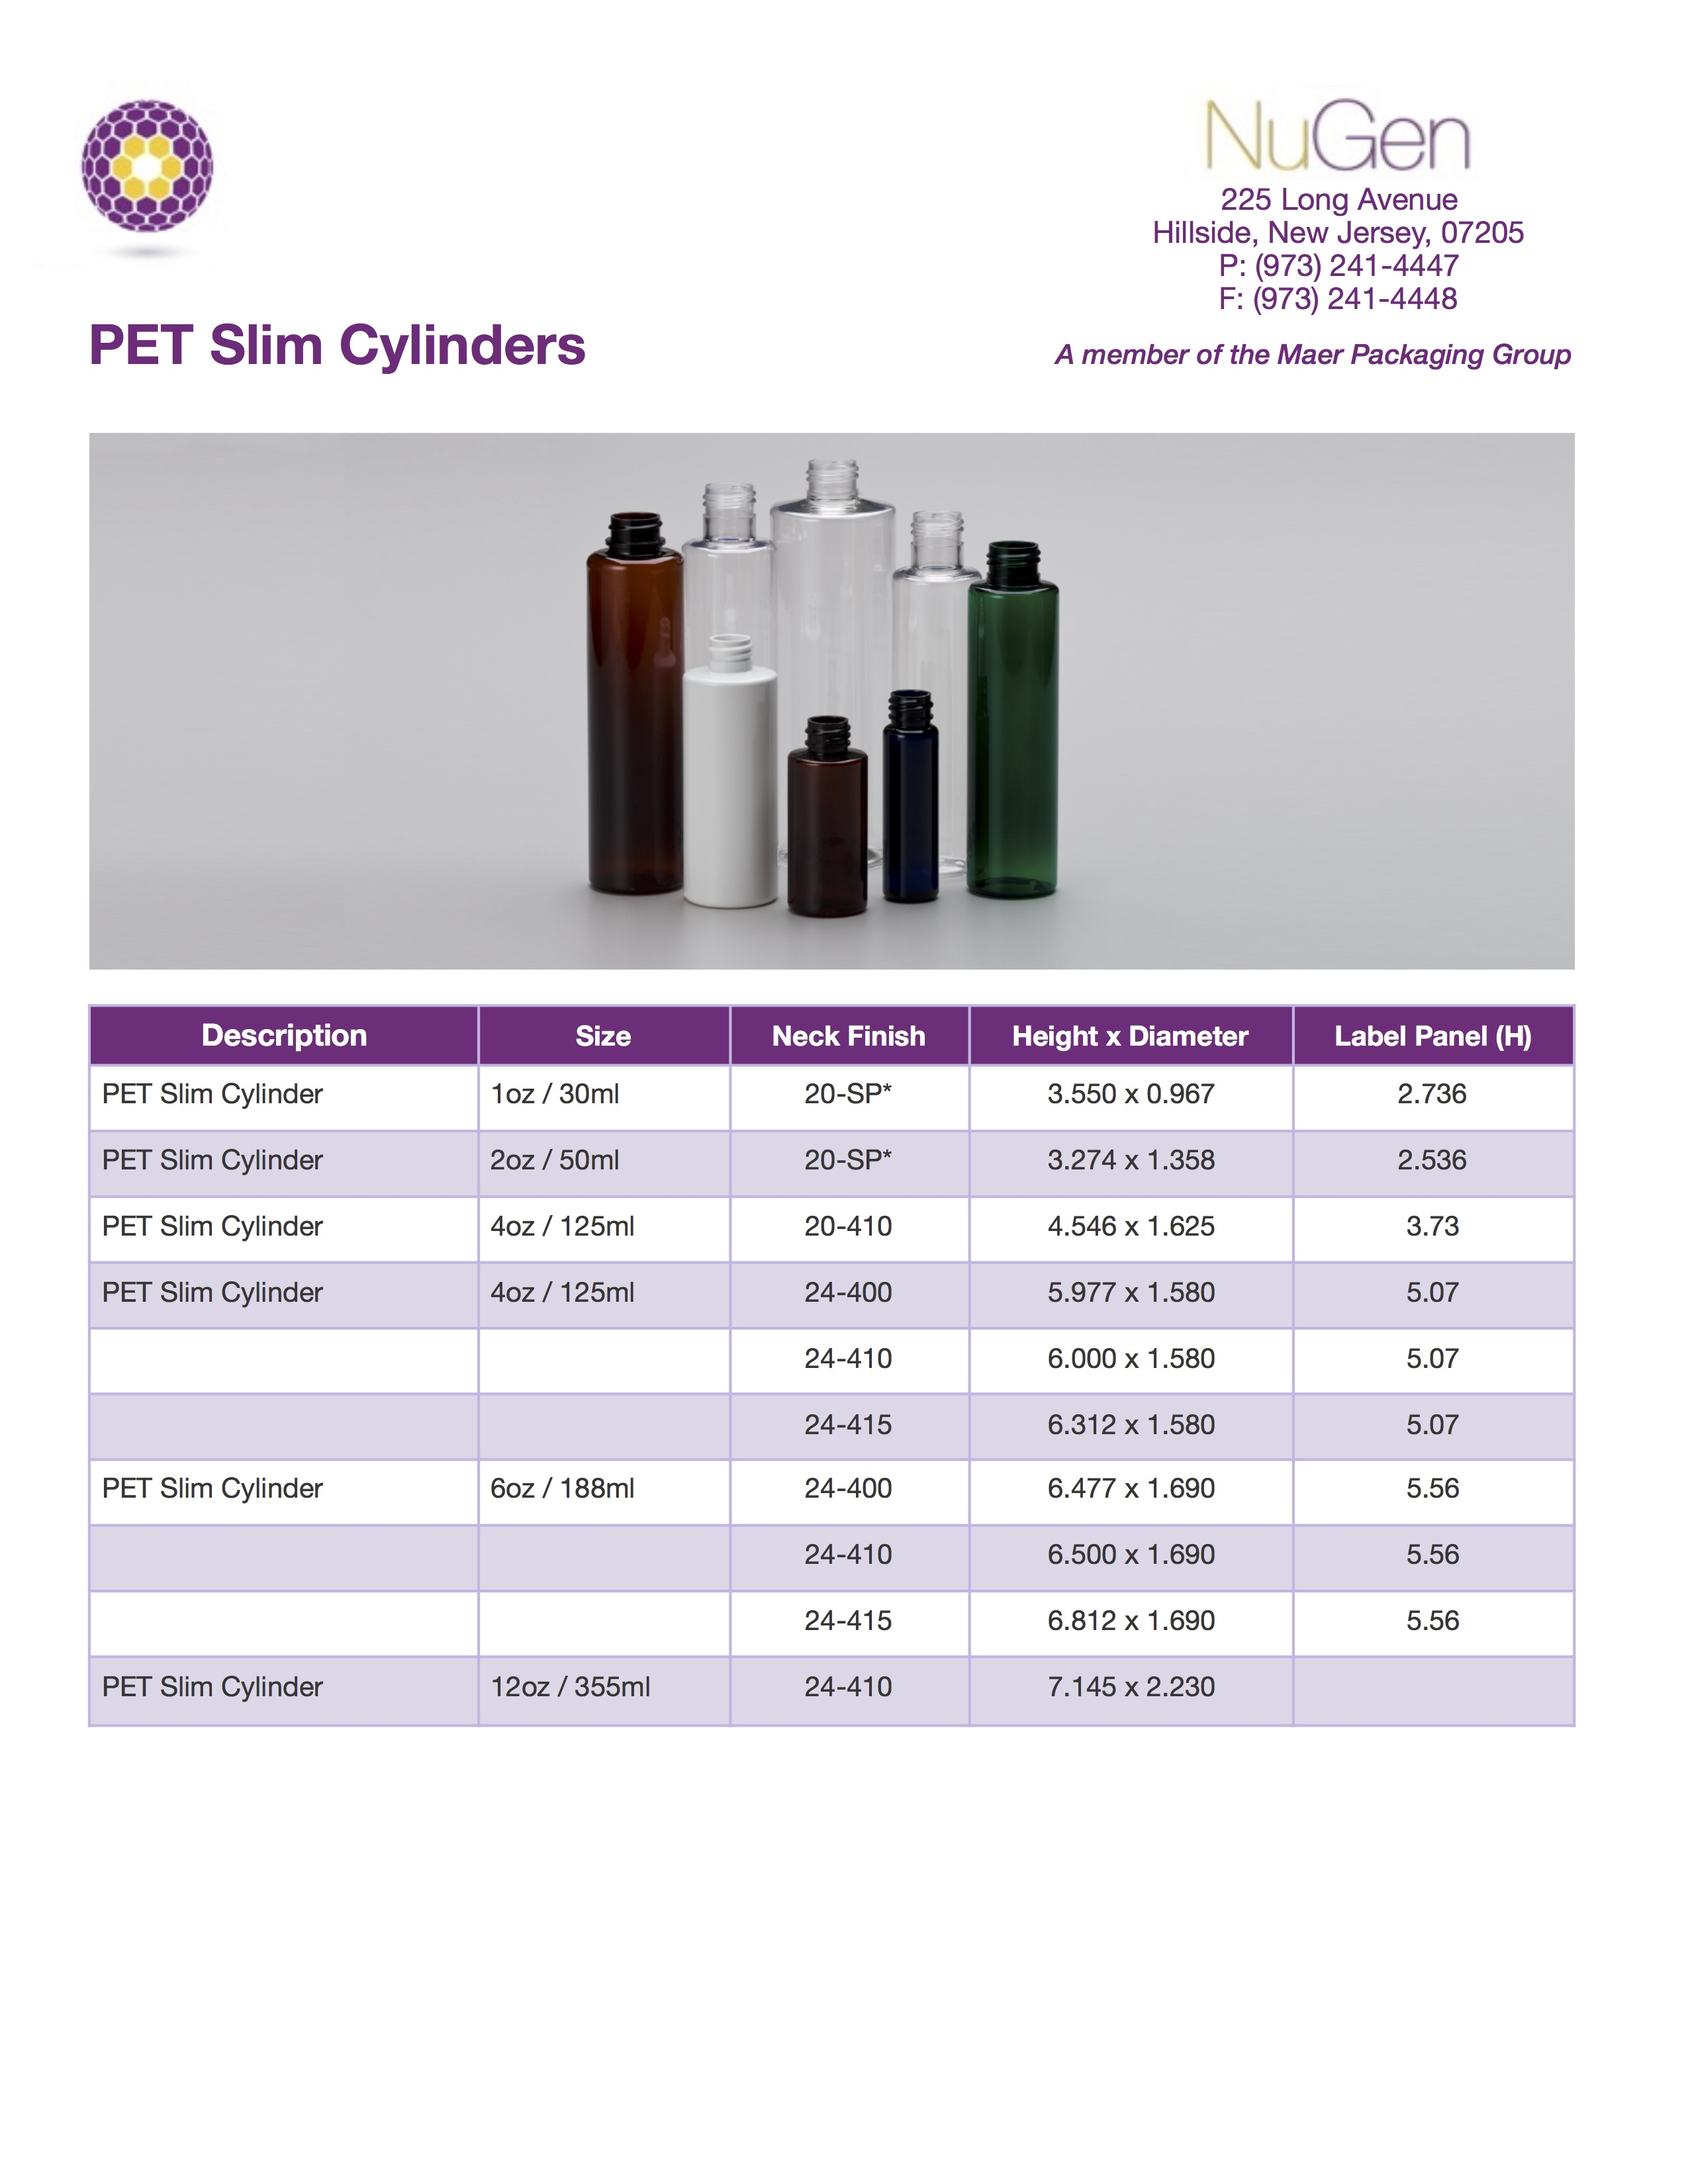 NUGEN_PET_Slim_Cylinders_12-2-2015